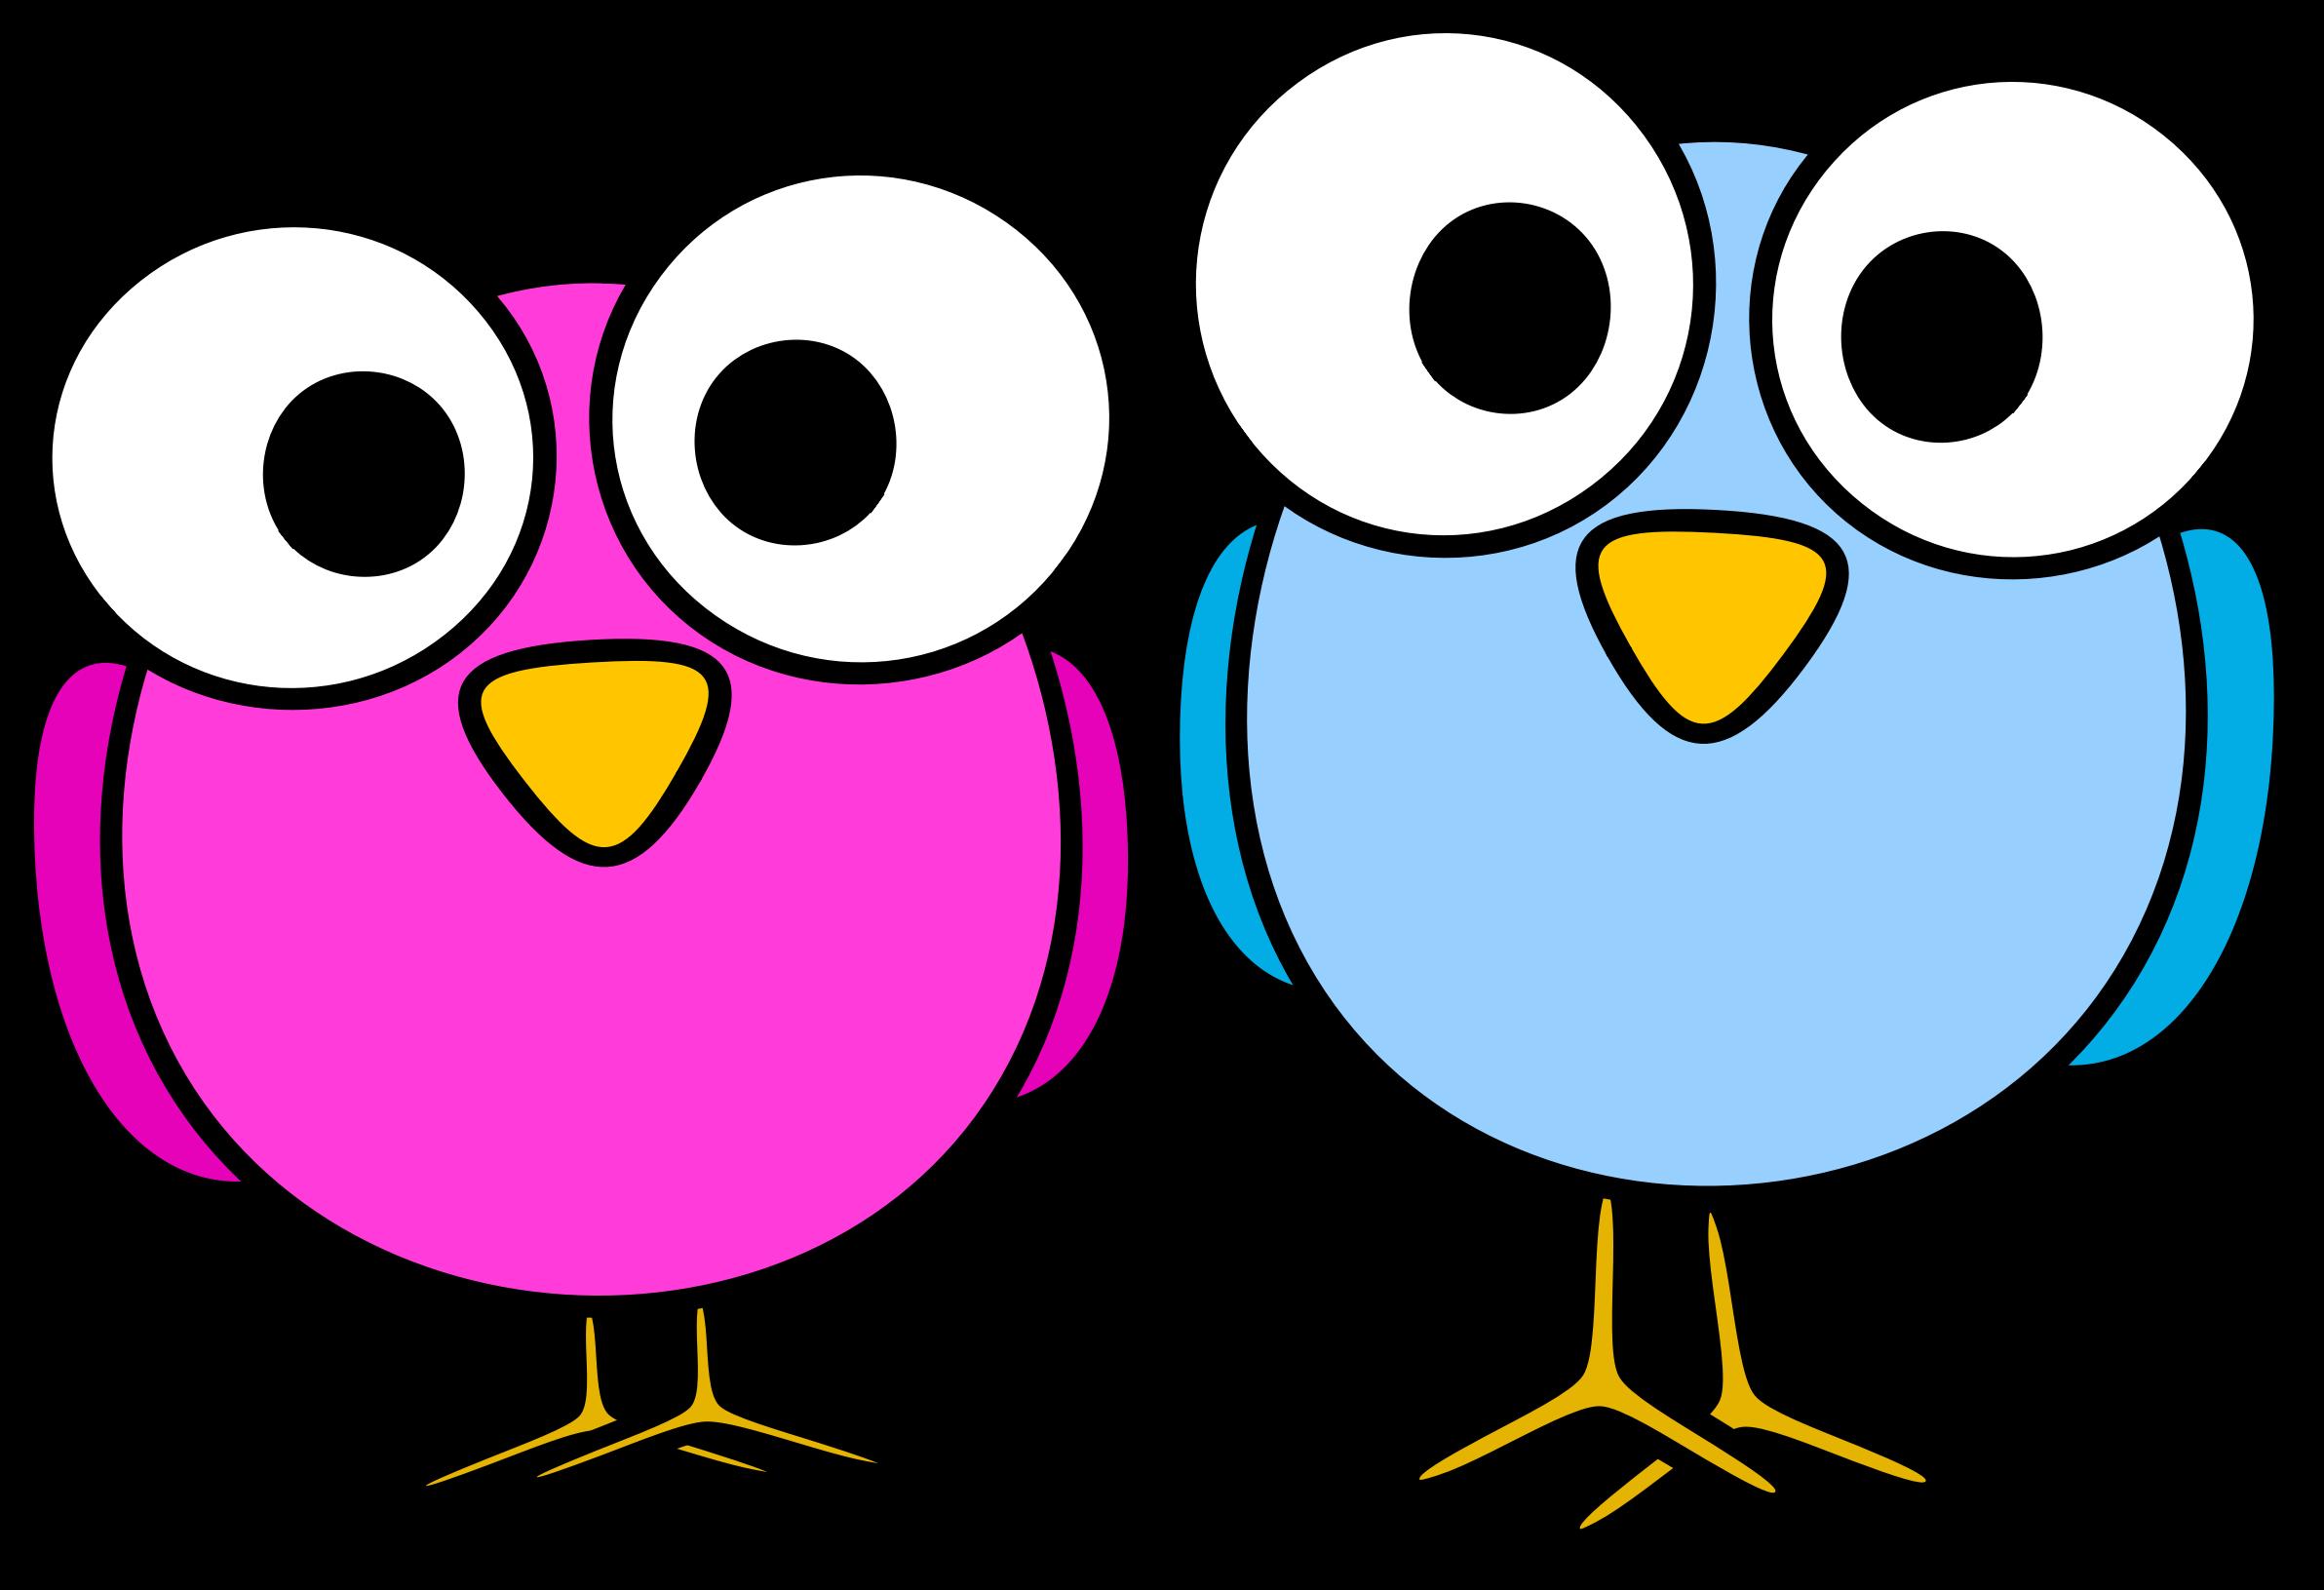 2384x1631 Googley Eye Birdies Icons Png